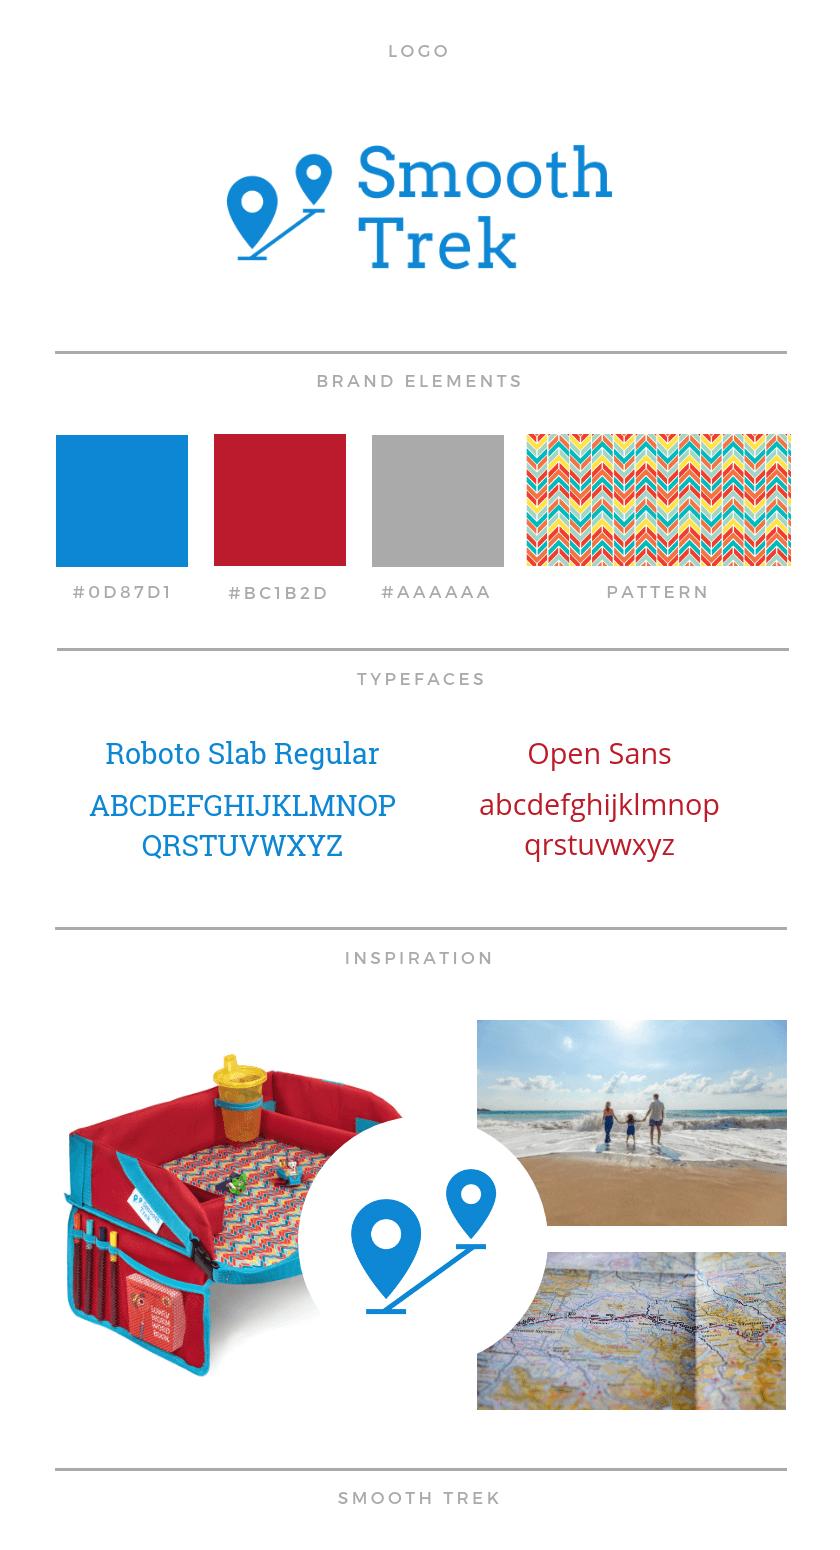 Smooth Trek Brand Board.png